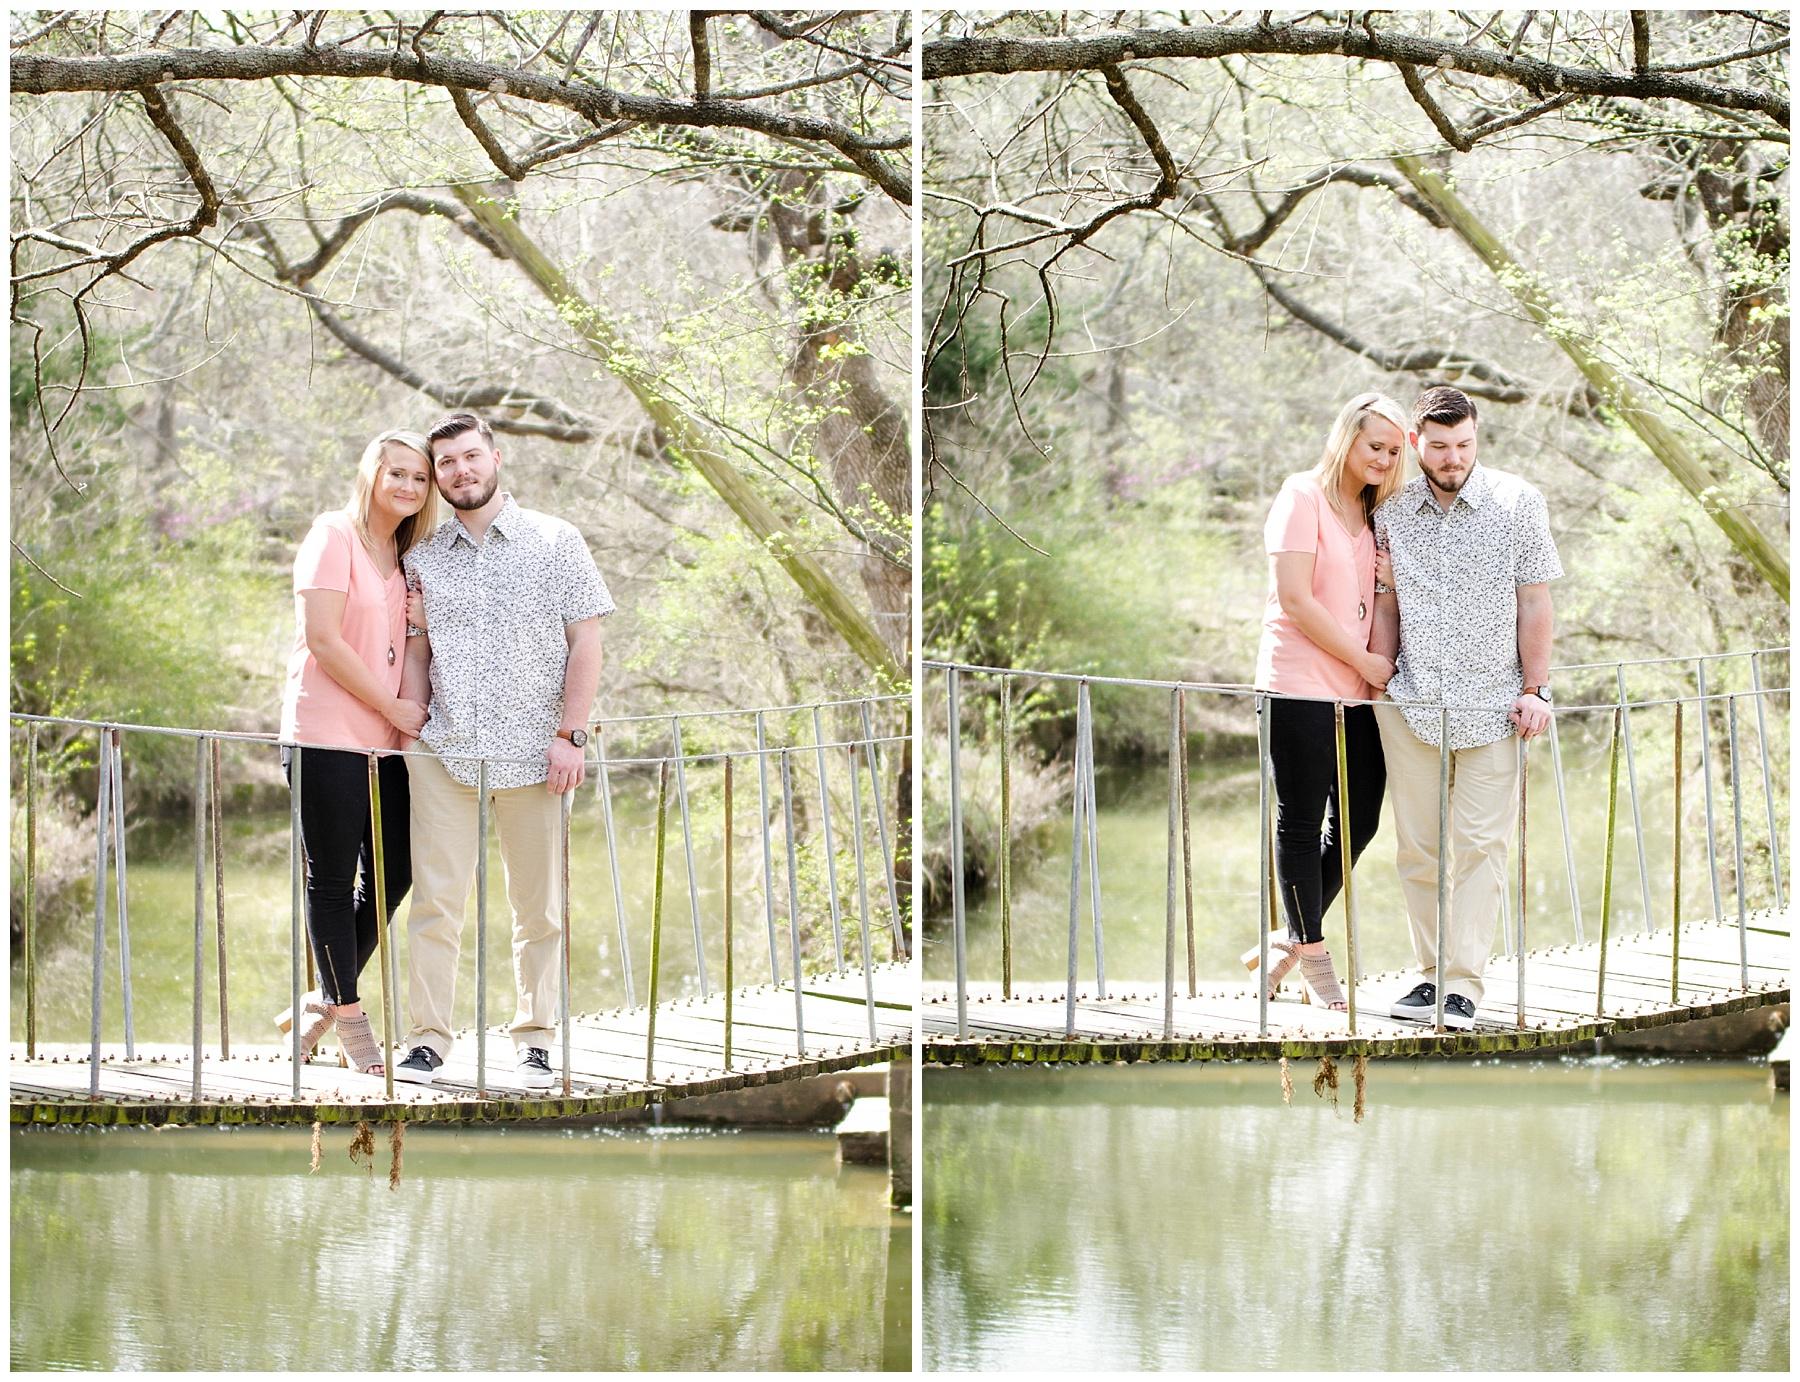 7-weston-gardens-ftworth-wedding-photography.jpg